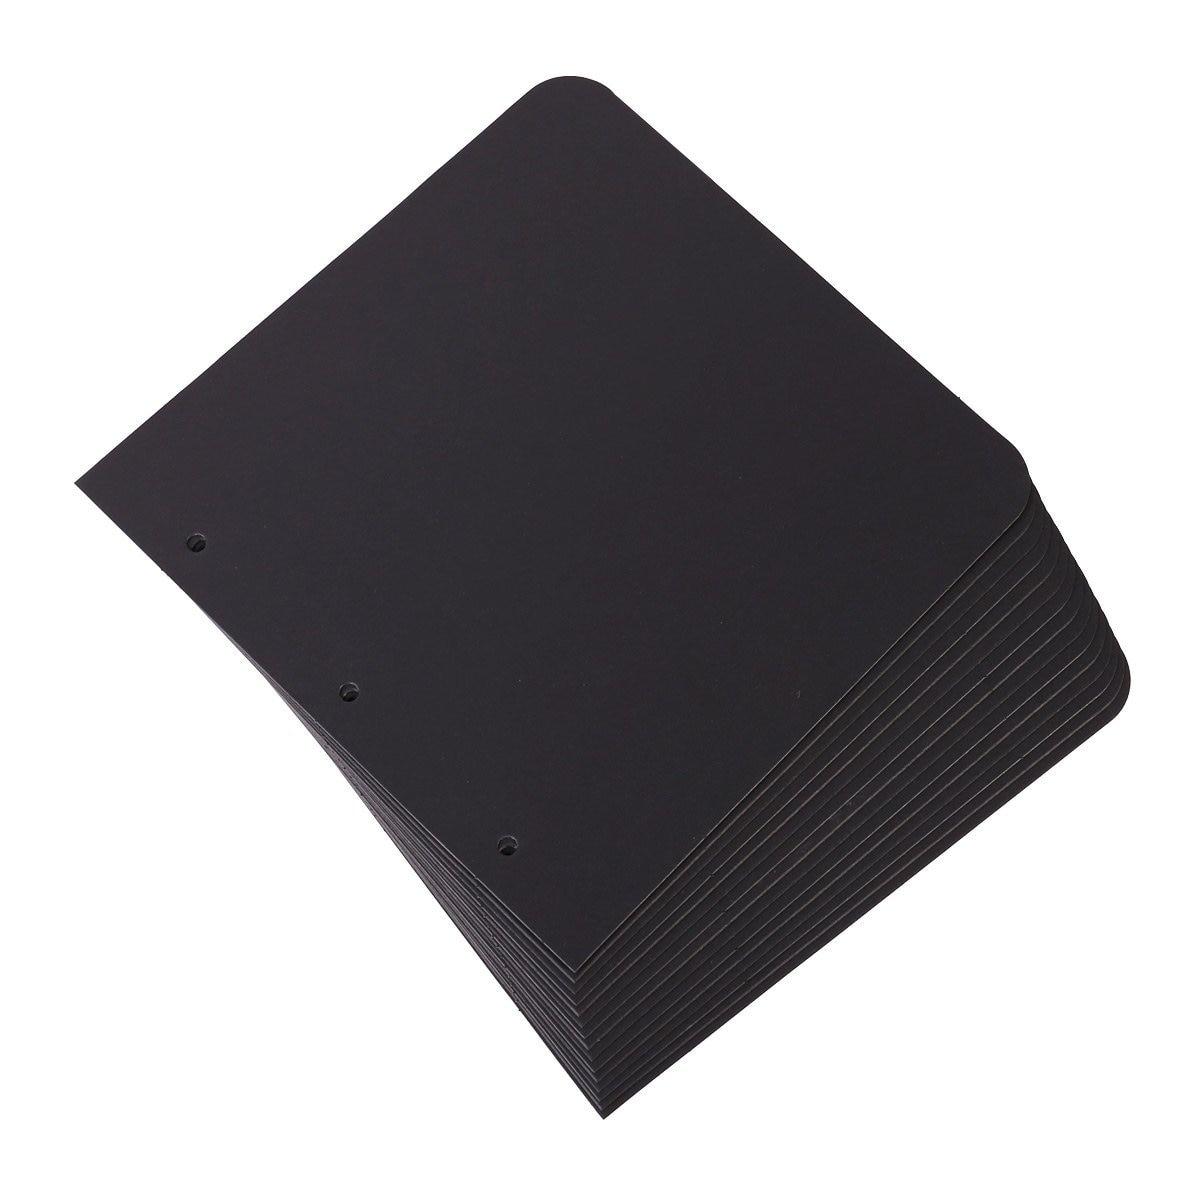 15 Pieces Black Scrapbook Paper For Scrapbook Album Refill Pages 8x8